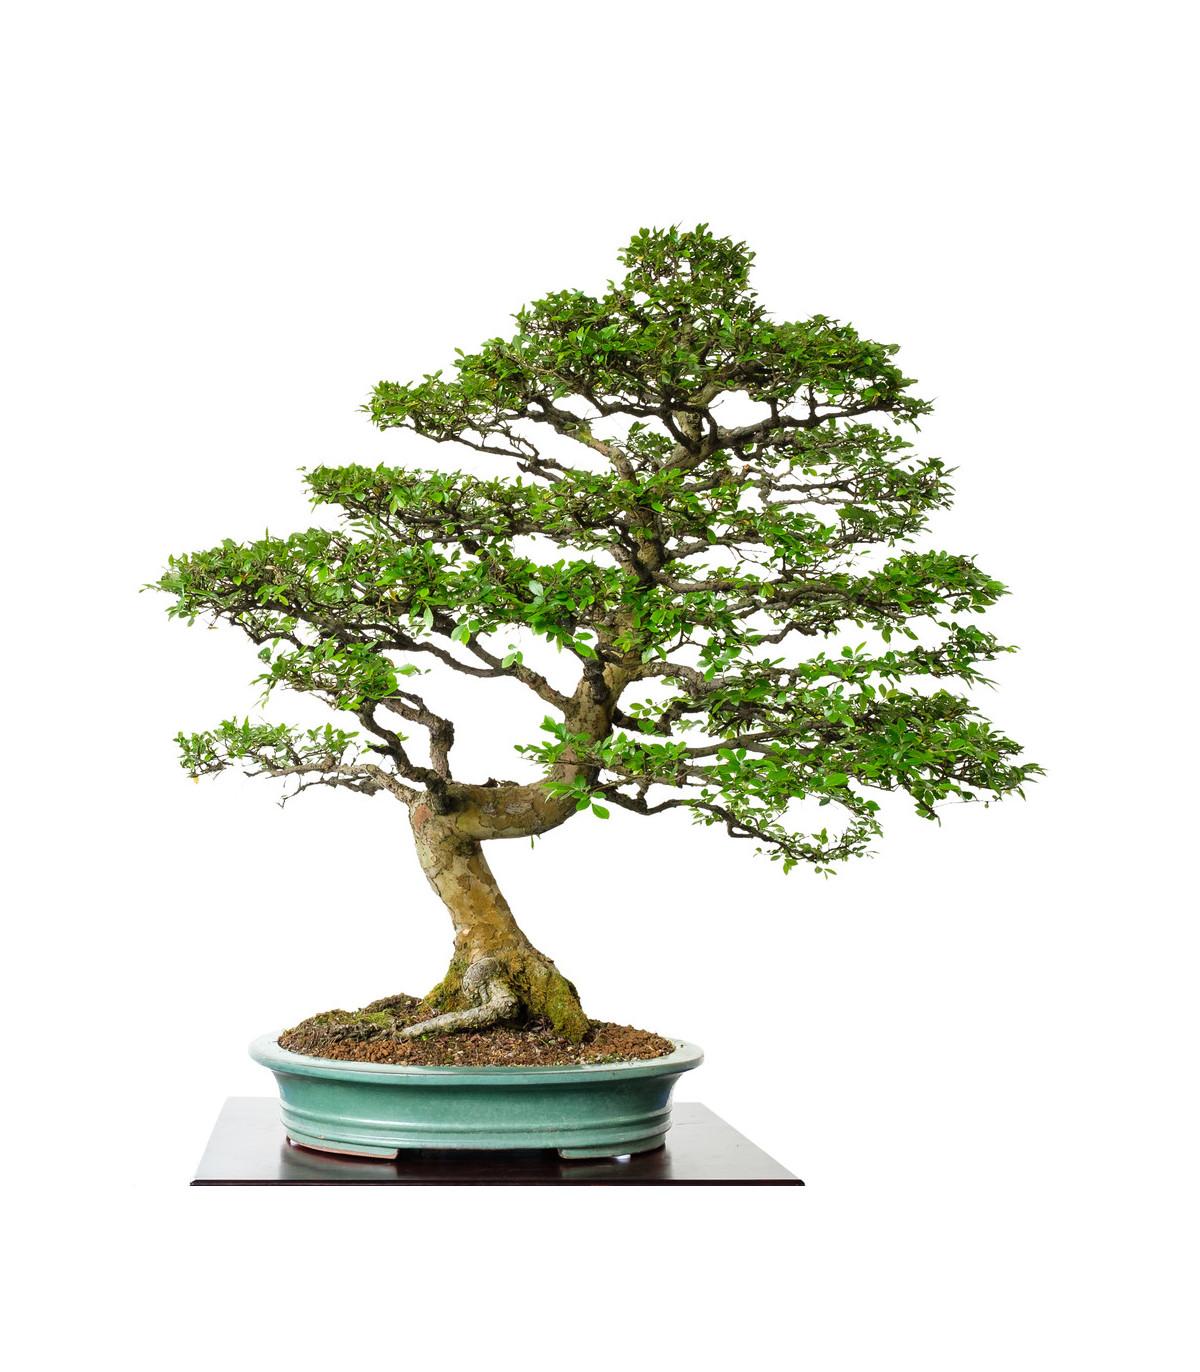 Brest čínsky - Ulmus parvifolia - bonsaj - semená bresta - 10 ks